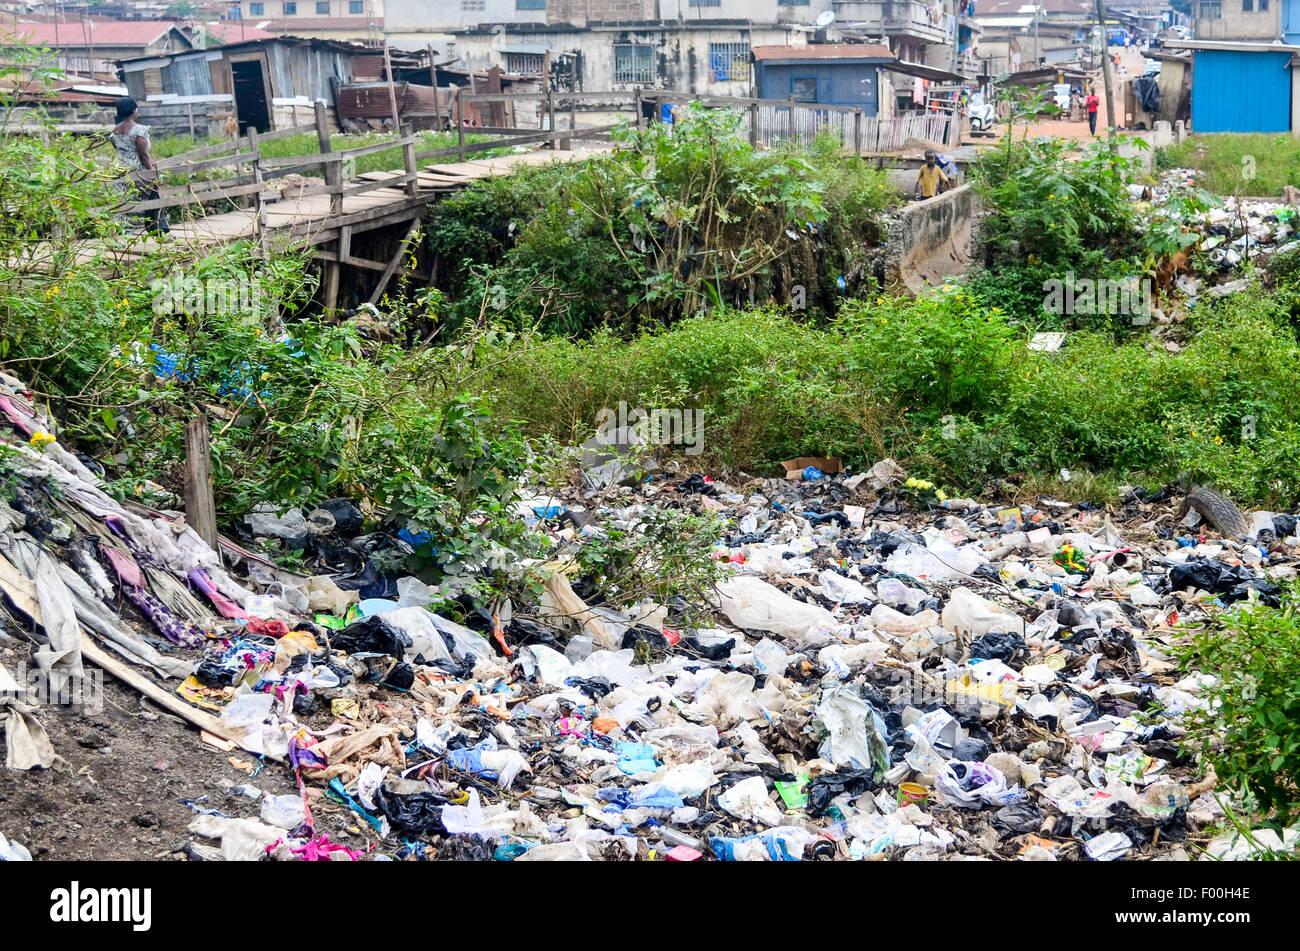 Trash in the poor suburbs of Kumasi, Ghana - Stock Image